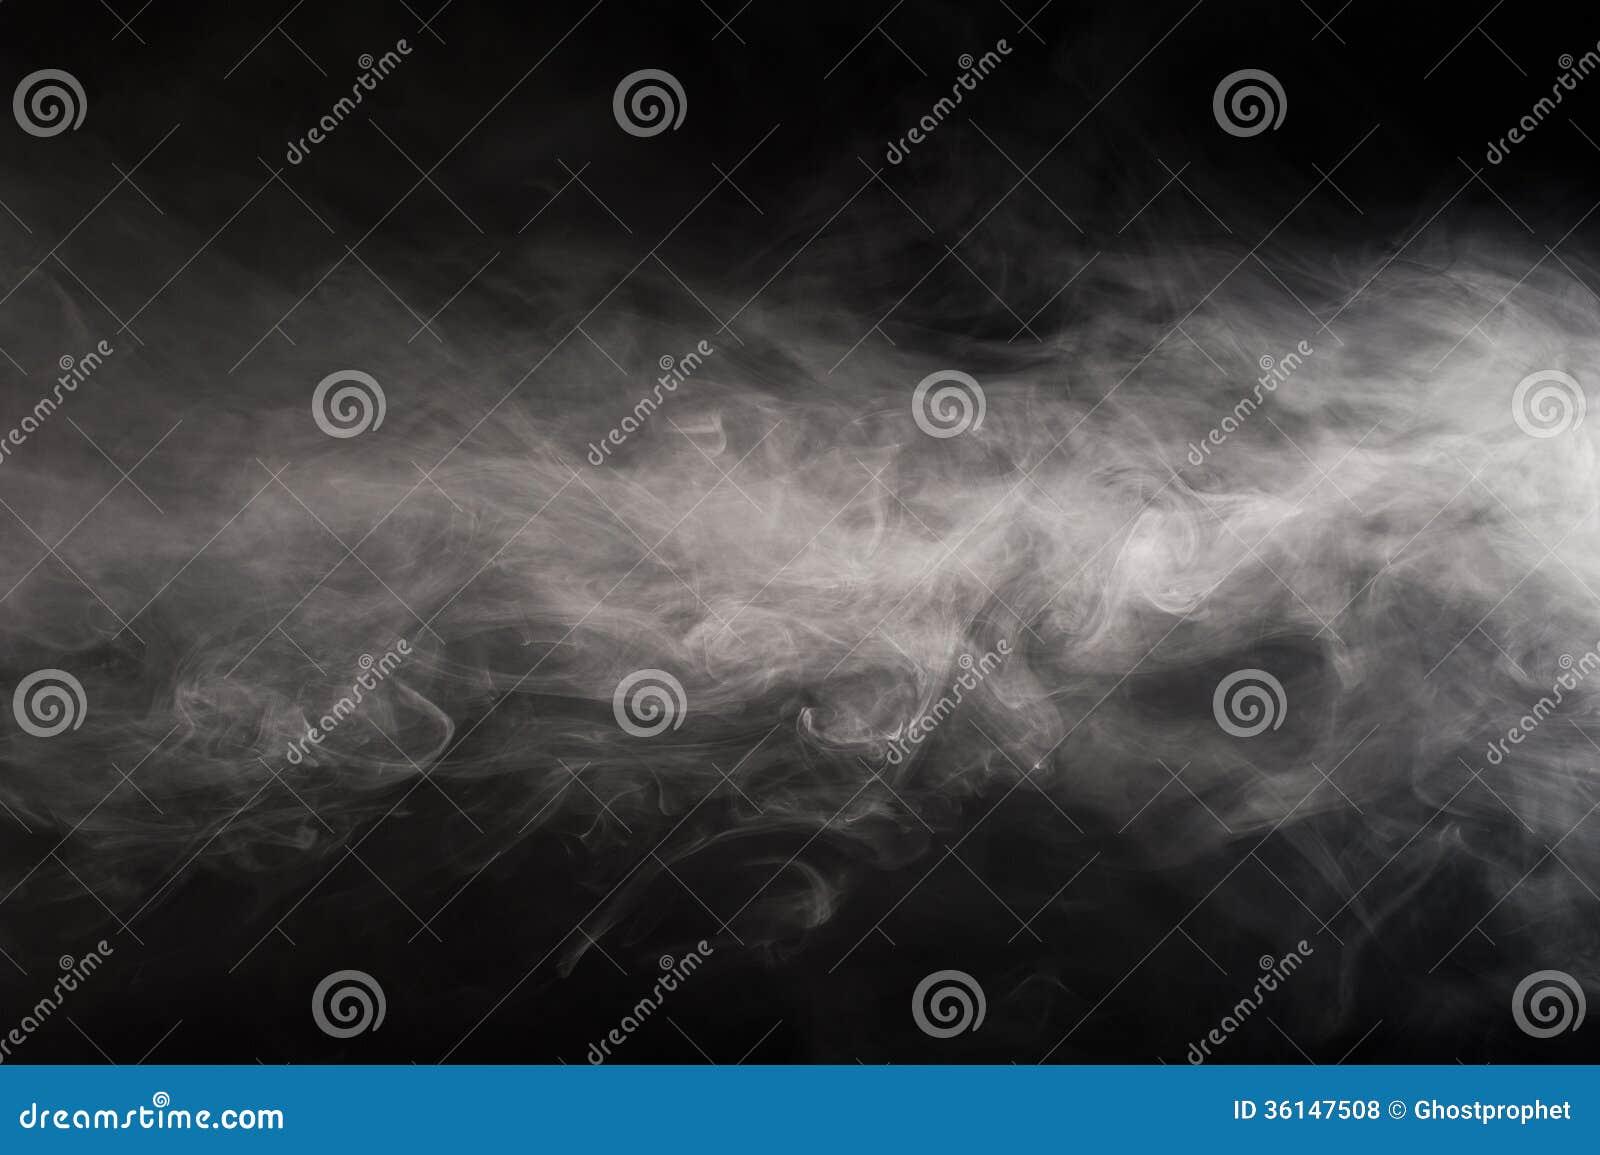 Поток дыма